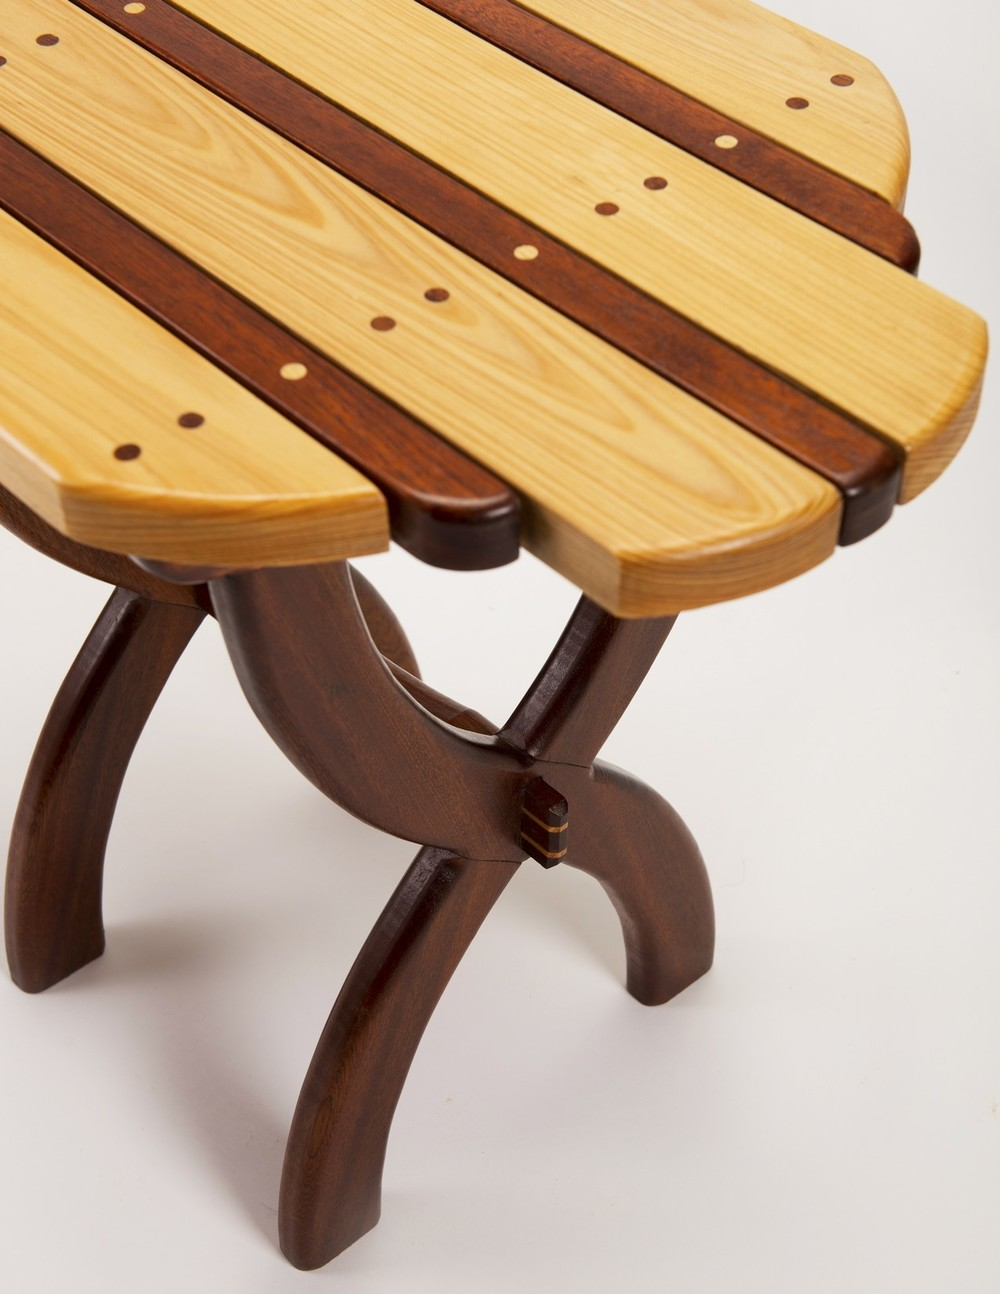 Furniture061.jpg